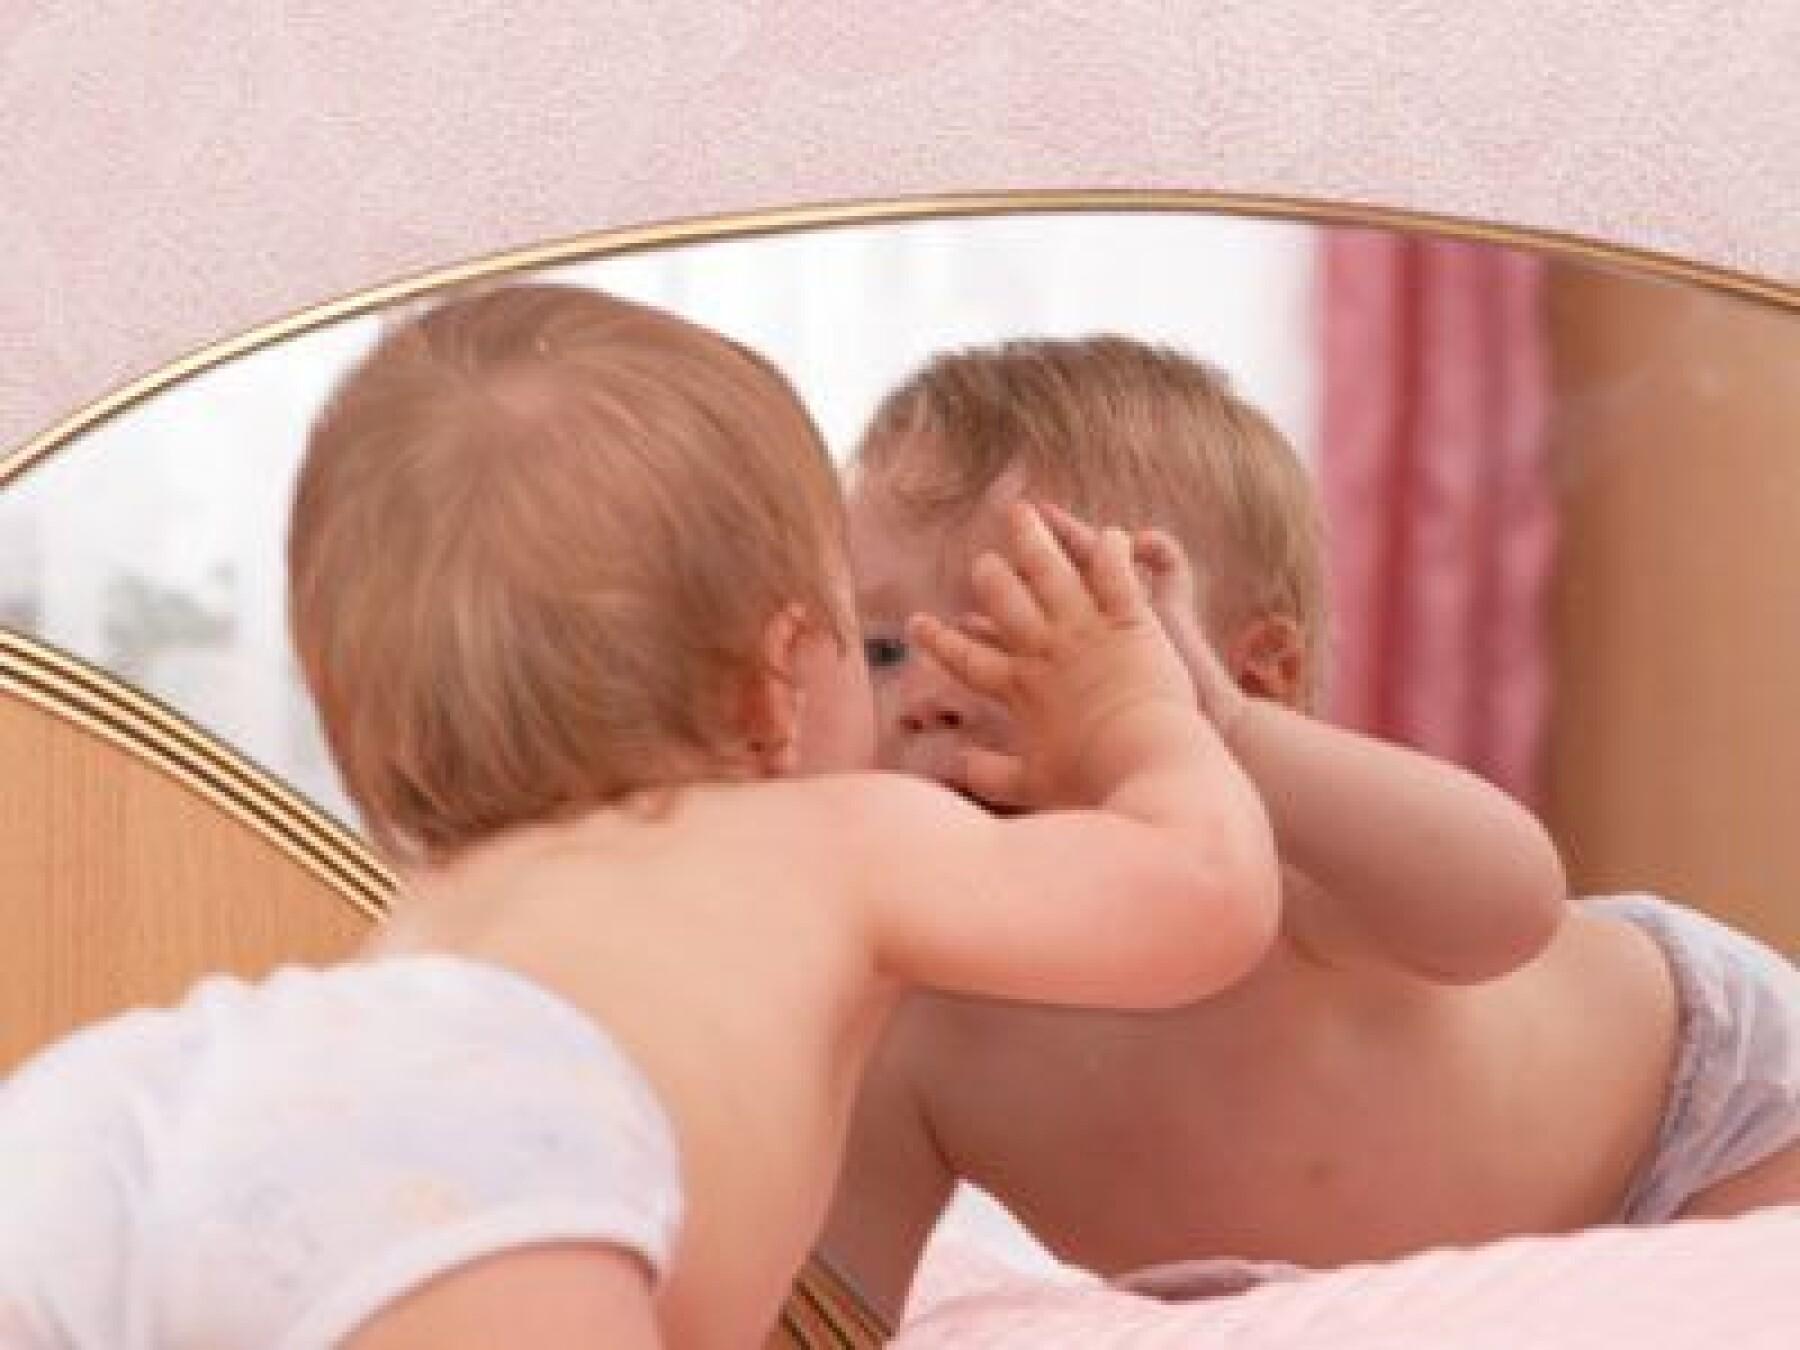 miroir et bébé